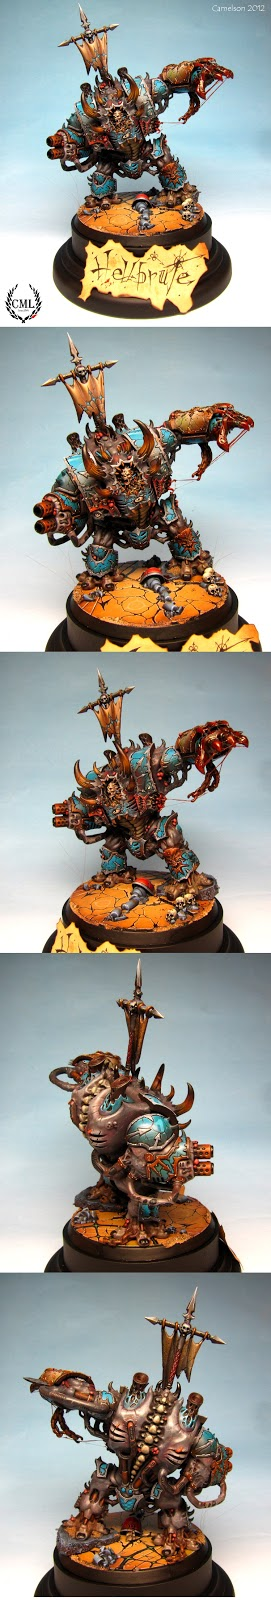 Bruto Infernal de la caja de Warhammer 40000: Venganza Oscura pintado por Camelson